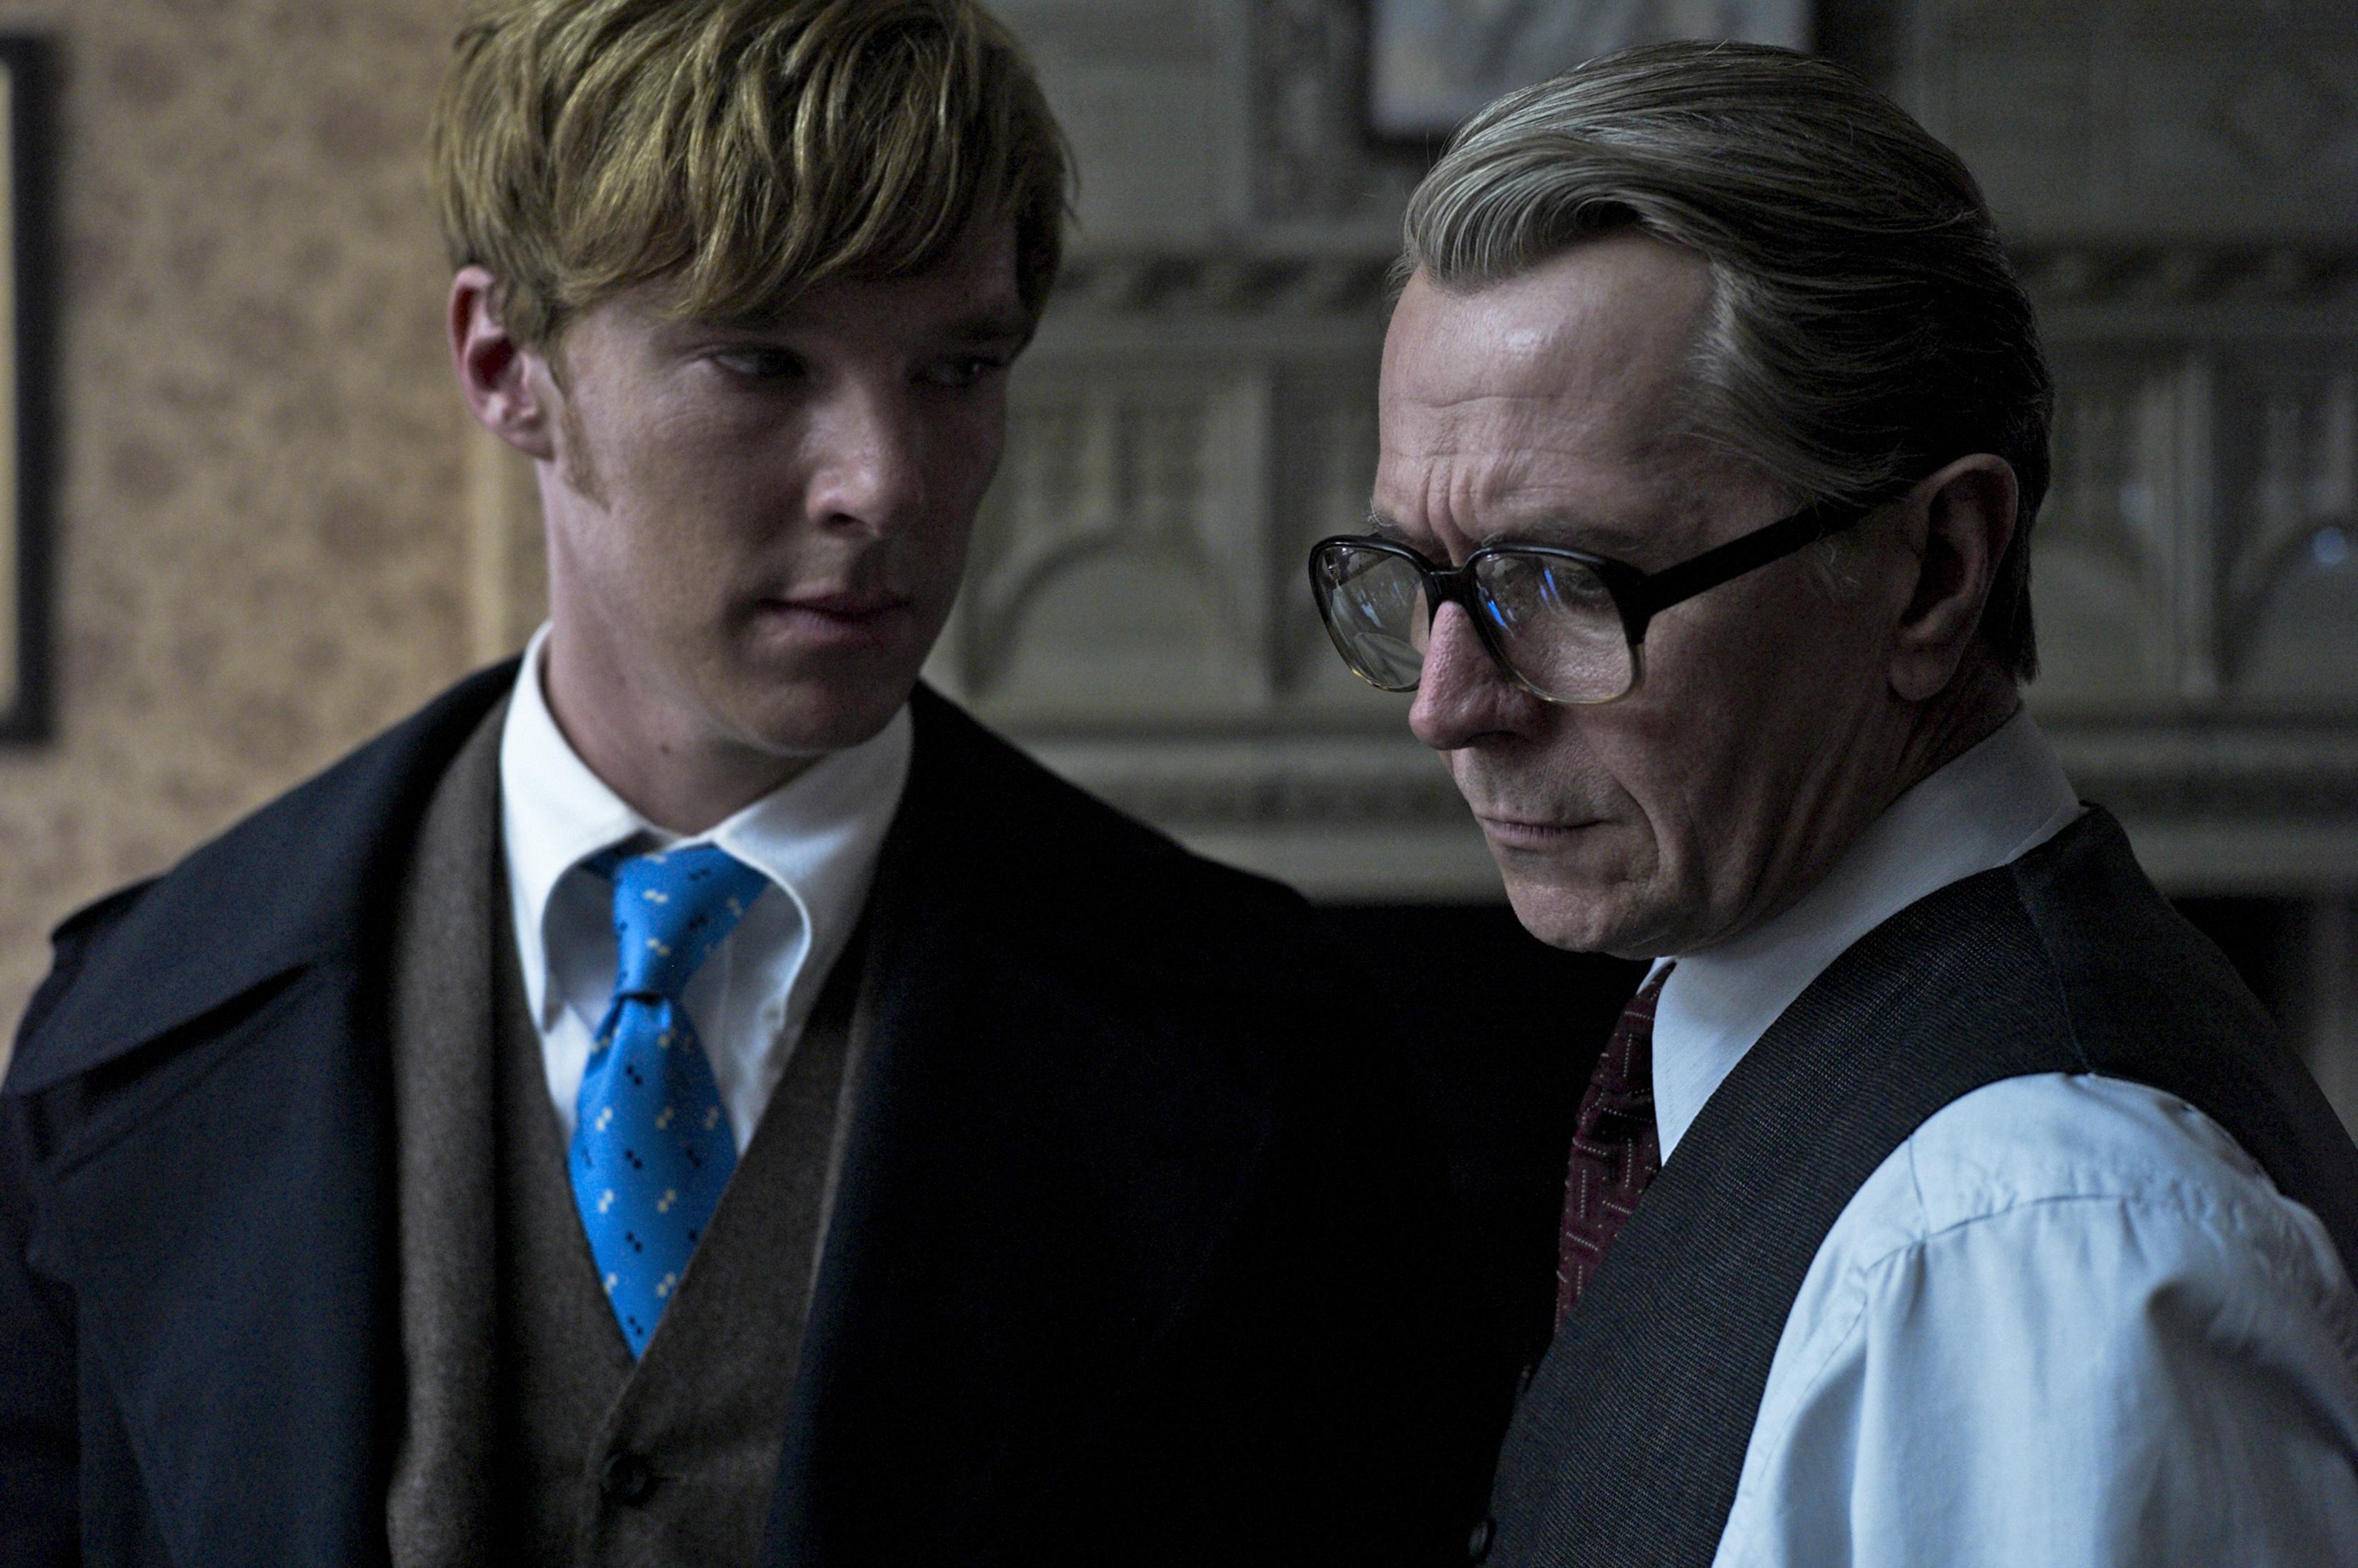 Benedict Cumberbatch en Gary Oldman in Tinker Tailor Soldier Spy